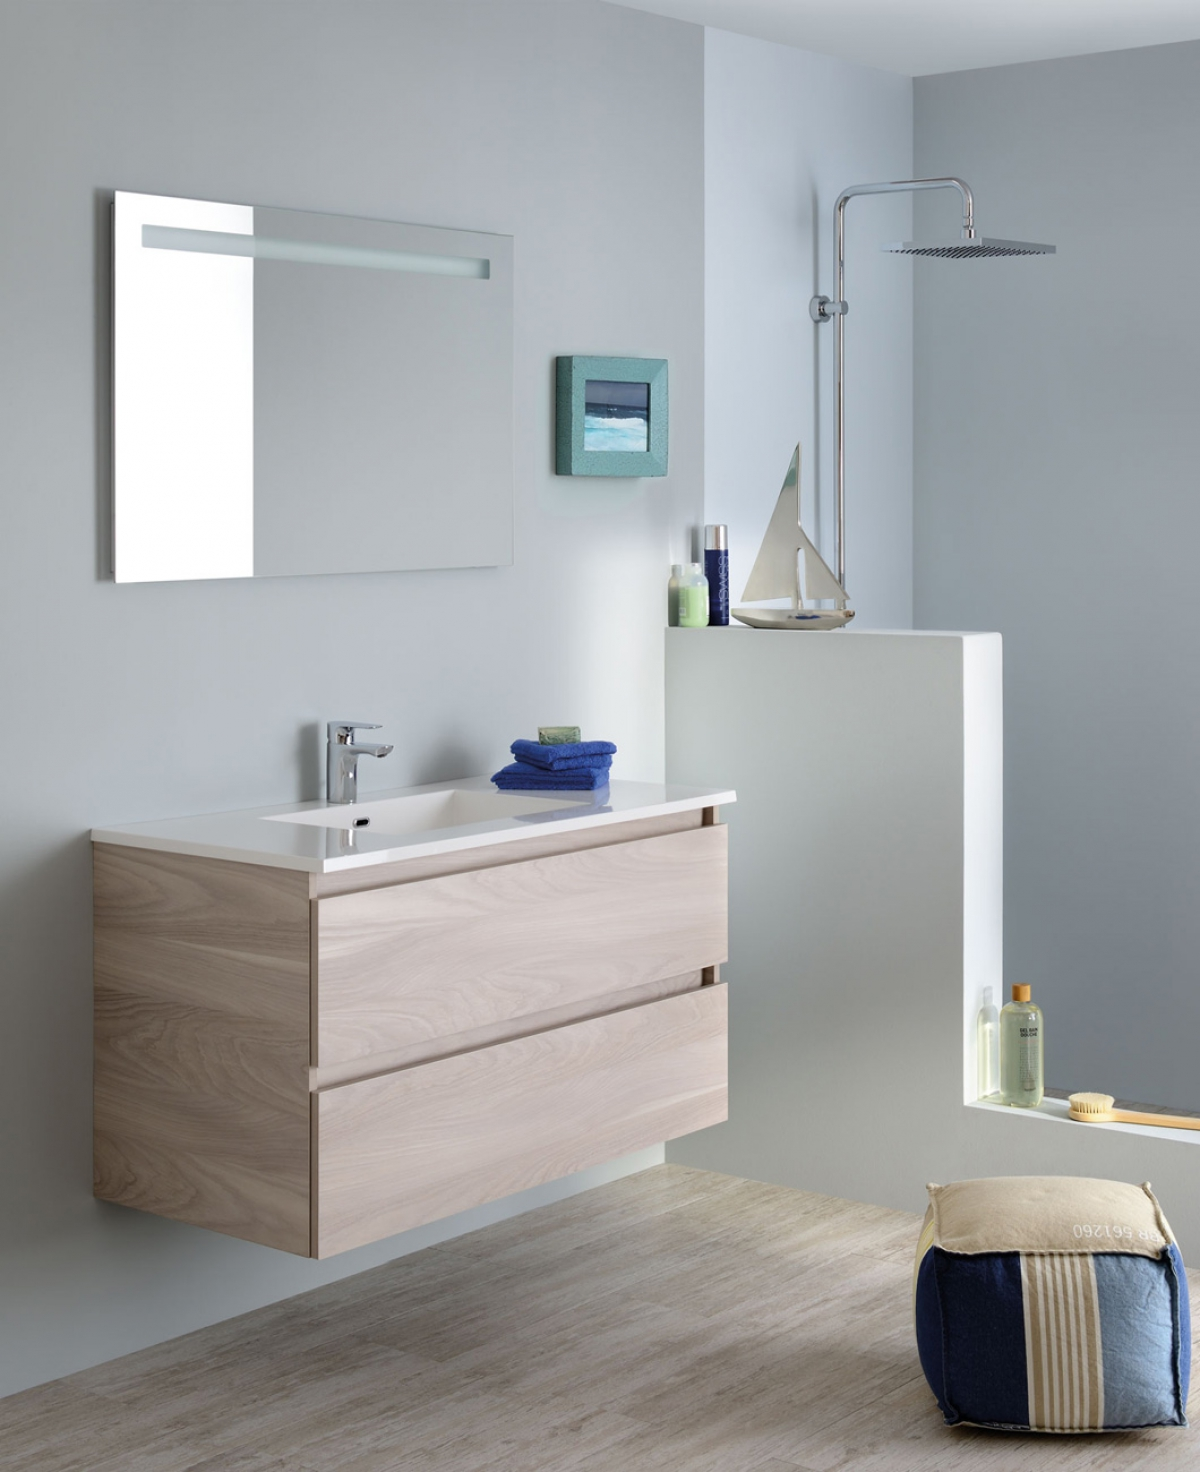 Meuble Salle De Bain Sanijura Xs ~ sanijura completino affordable meuble with sanijura completino